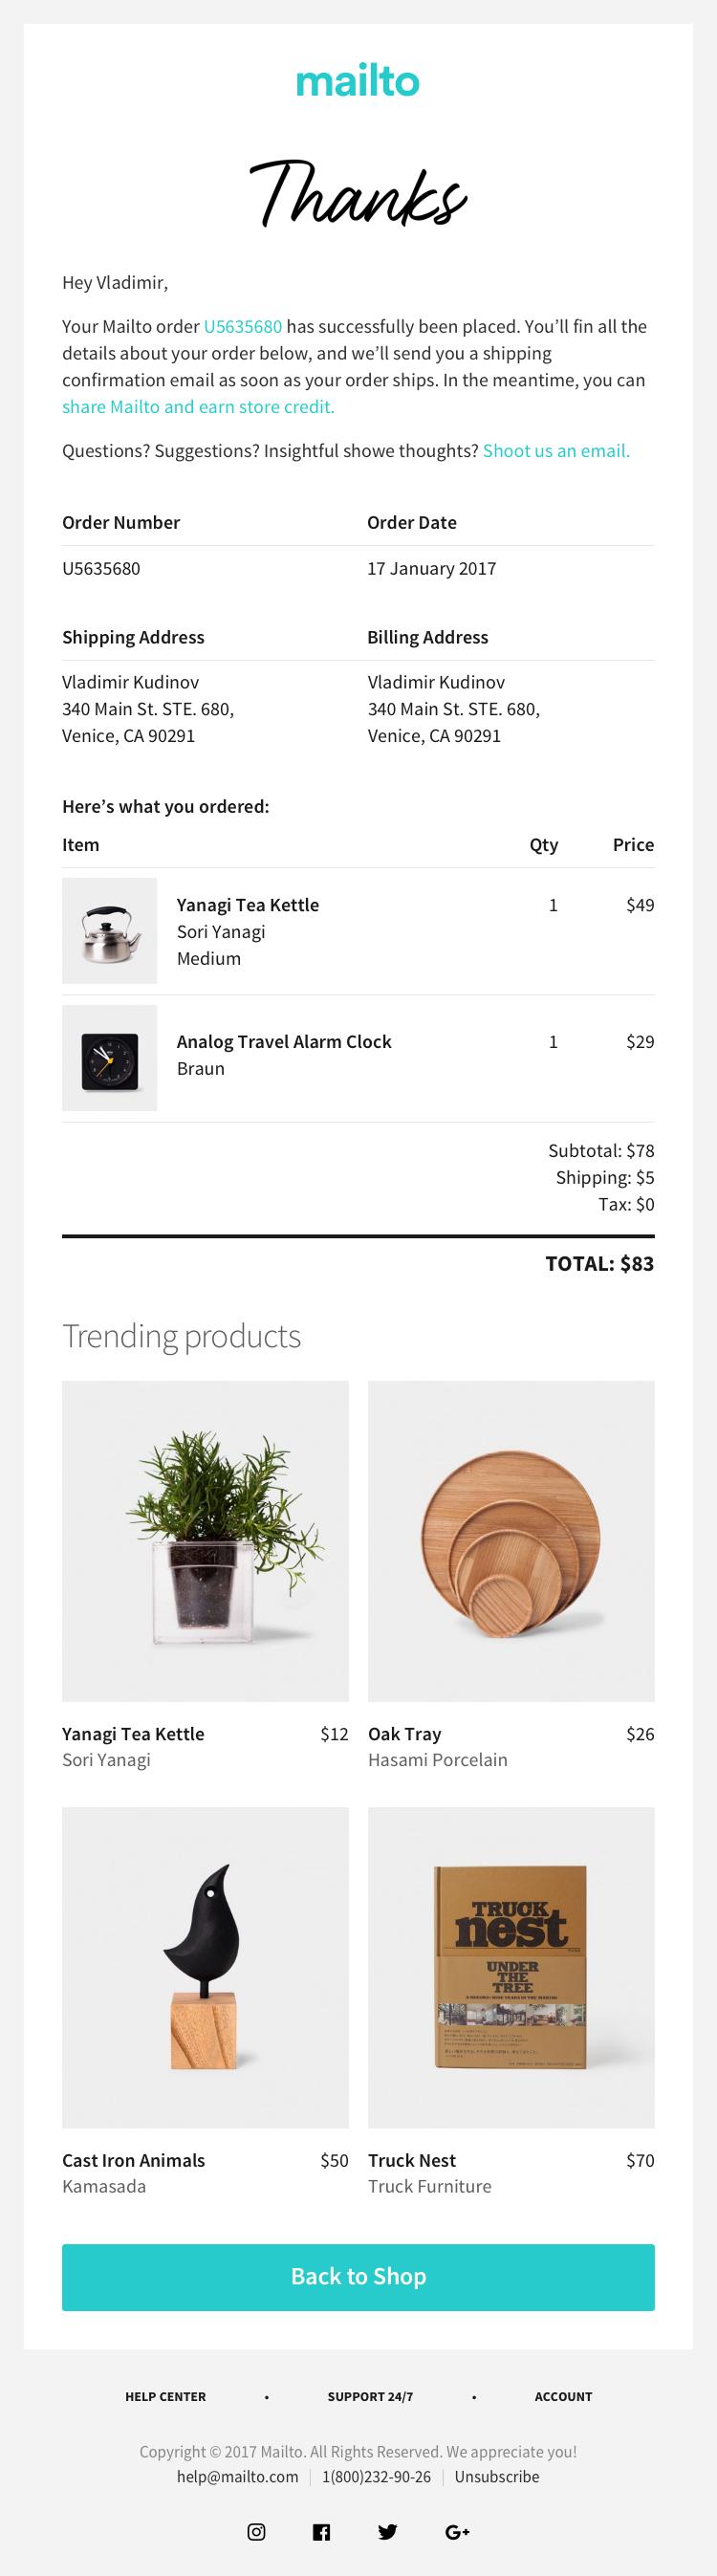 mailto - Thanks for Order